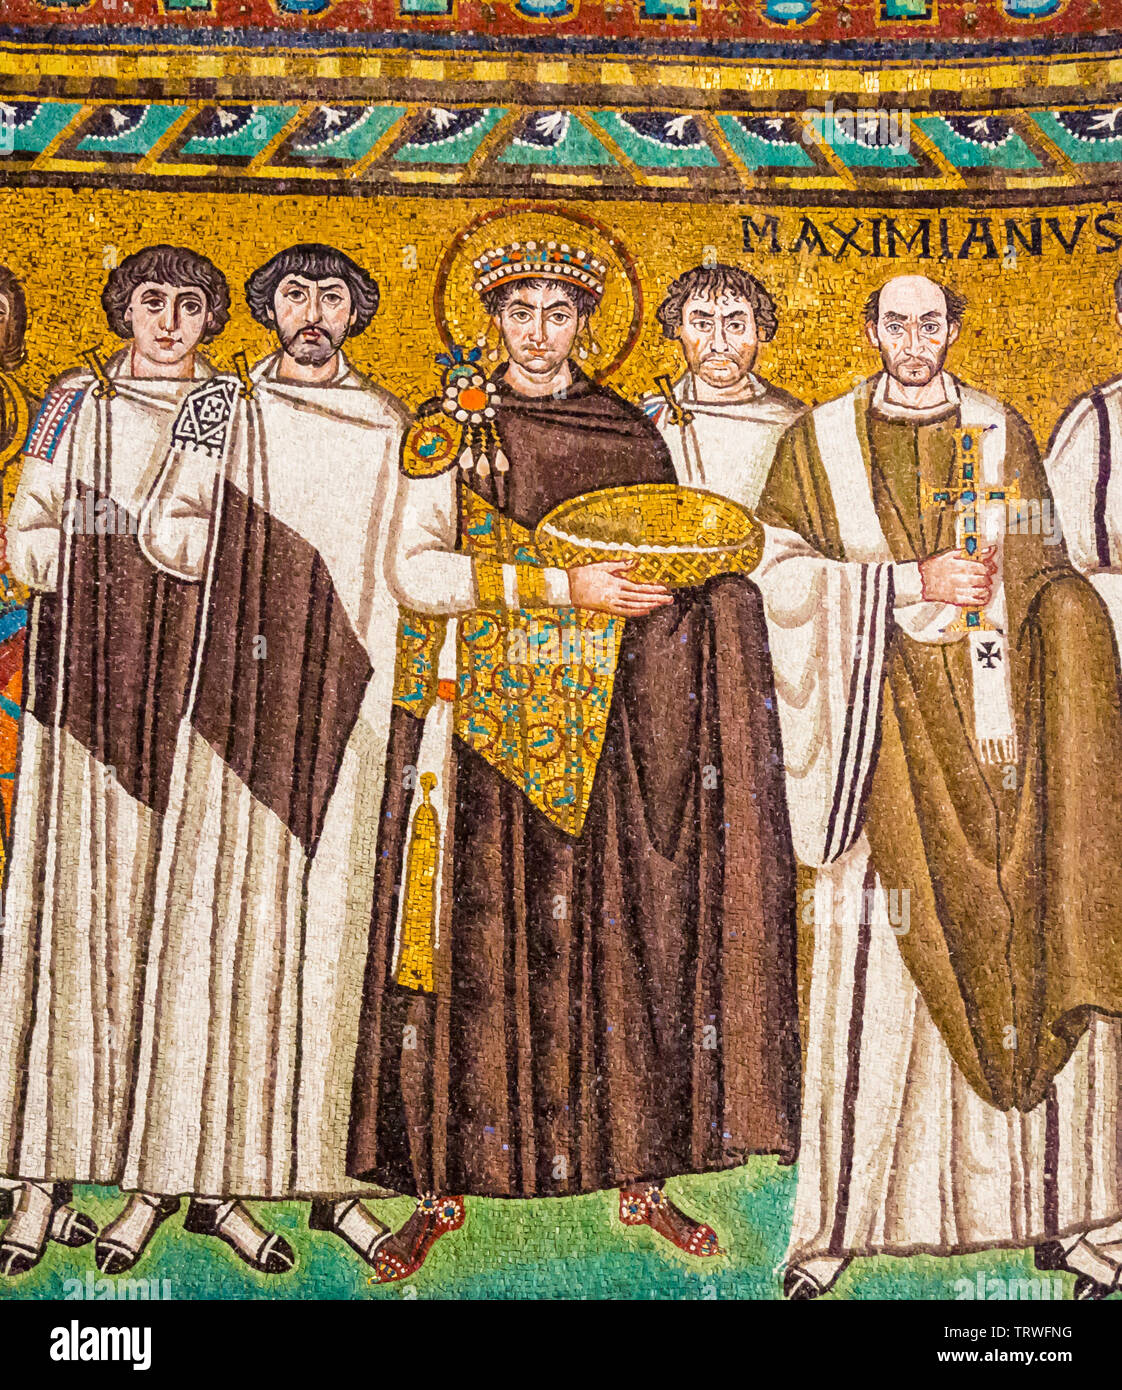 mosaic-of-byzantine-emperor-justinian-bishop-maximian-general-belisarius-and-attendants-basilica-of-san-vitale-ad547-ravenna-emilia-romagna-italy-TRWFNG.jpg